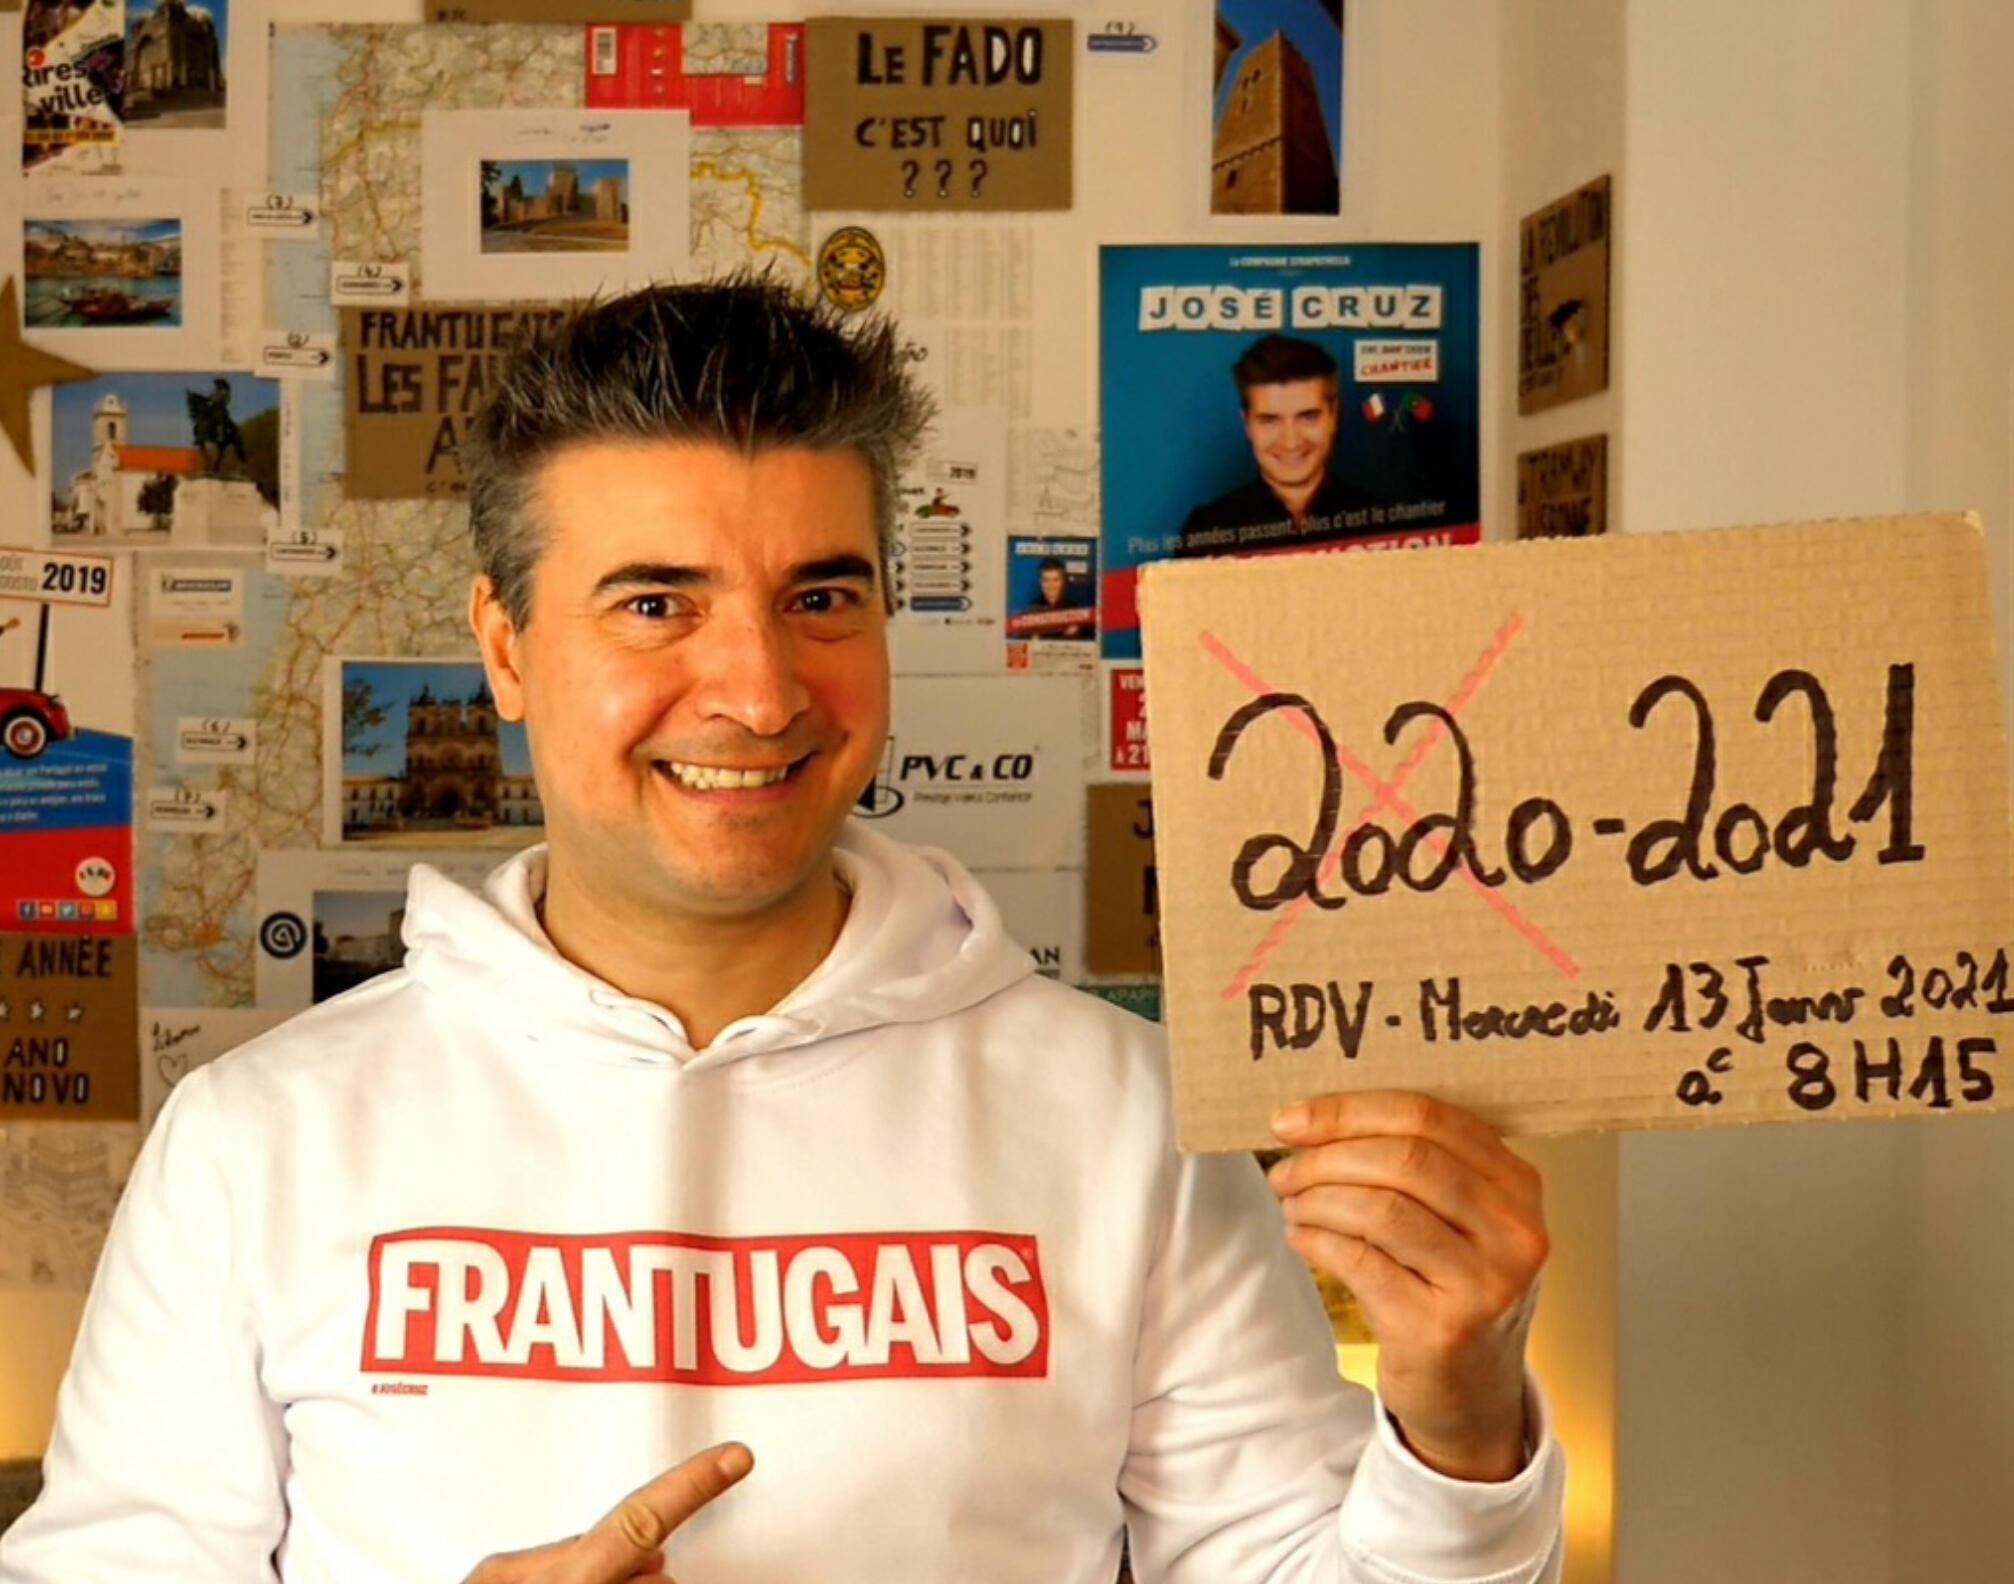 José Cruz - Cultura - Teatro - Moda - Economia - França - Culture - Frantugais